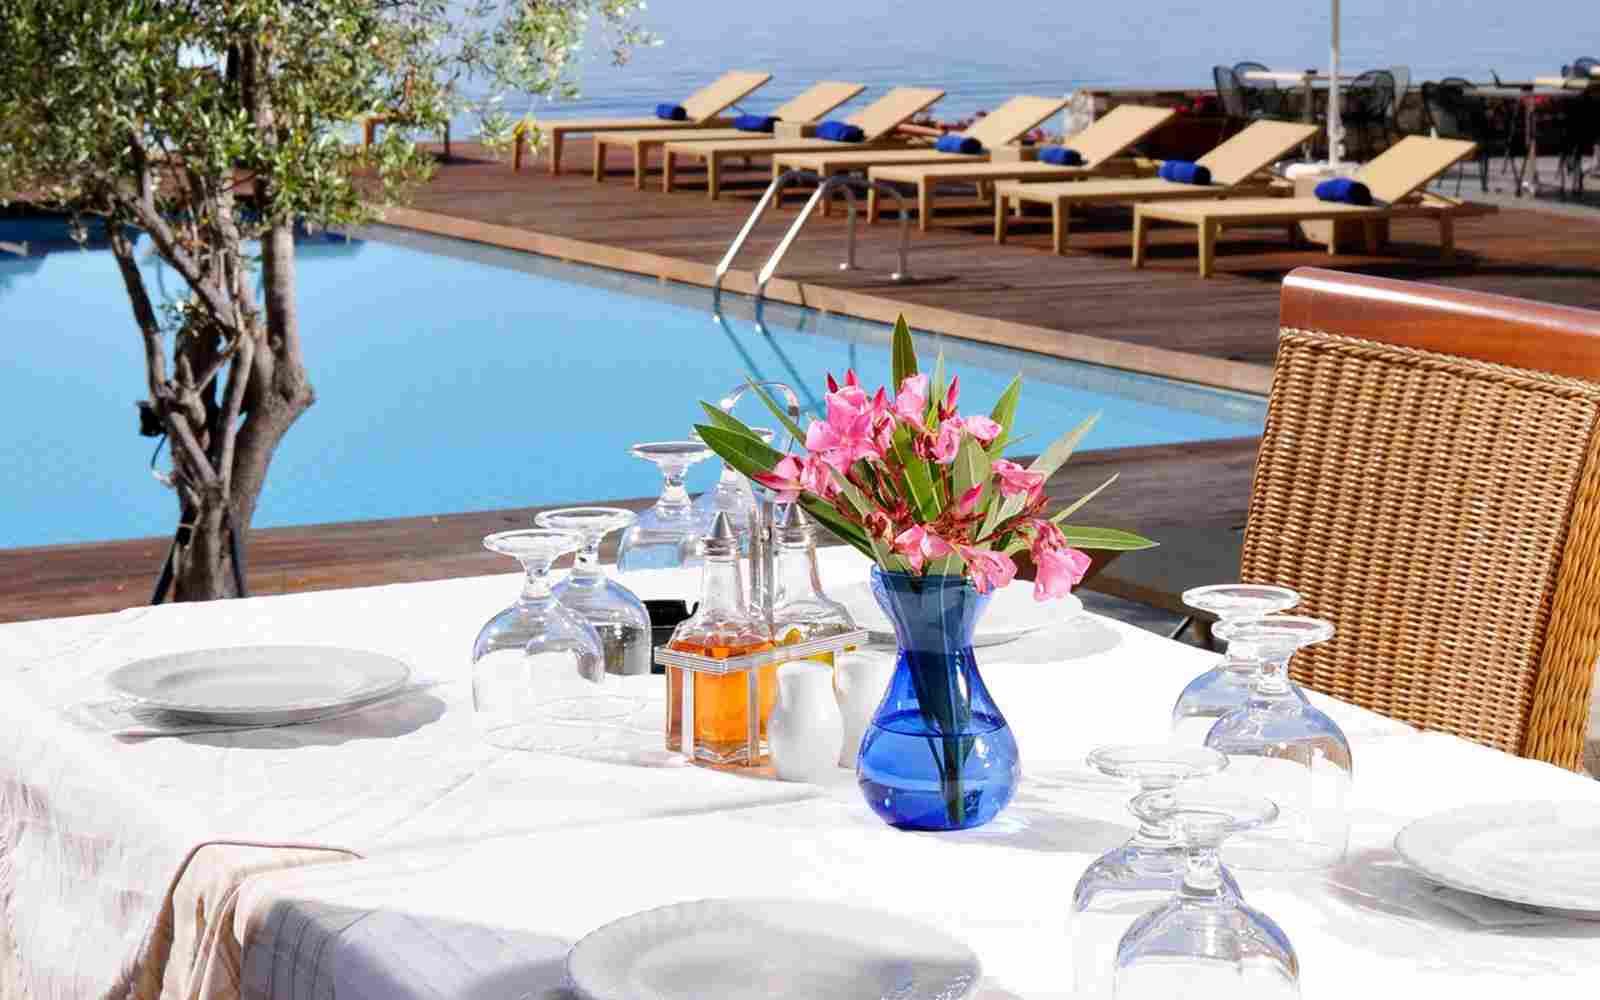 https://www.bellacosta.org/wp-content/uploads/2016/03/summer-hotel-09.jpg